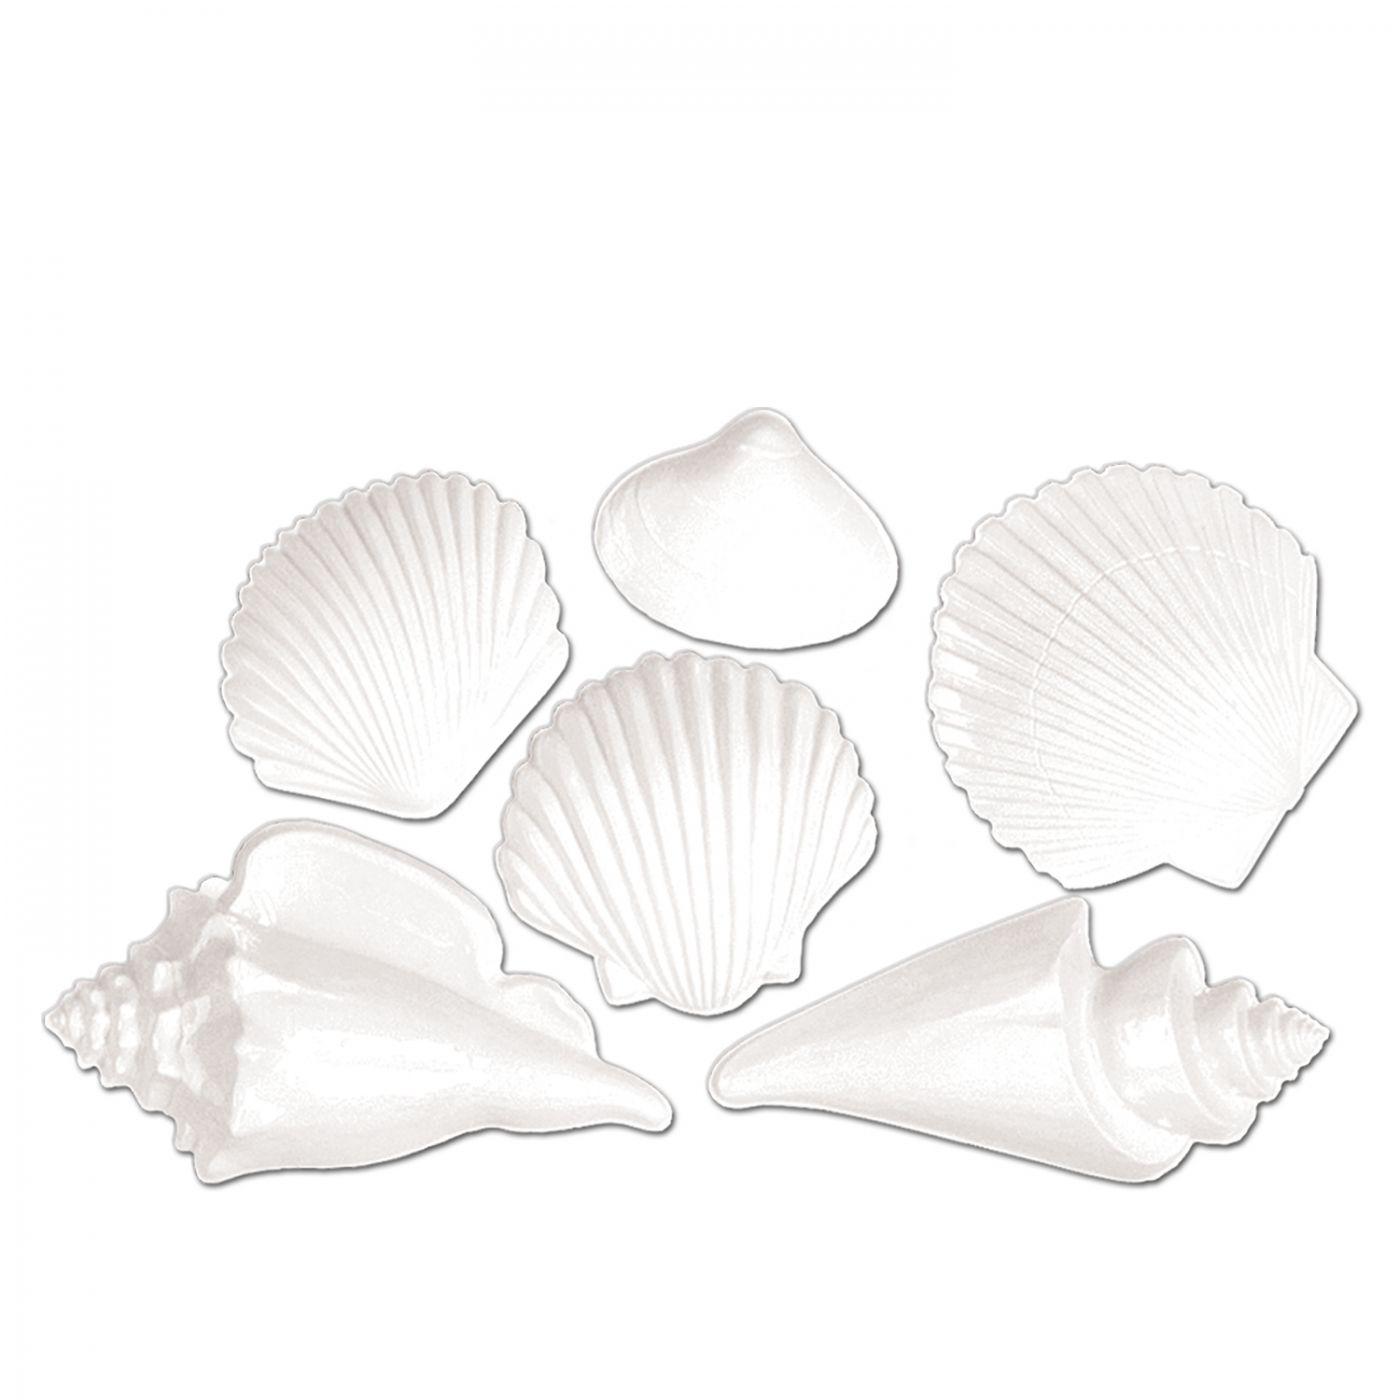 White Plastic Seashells image